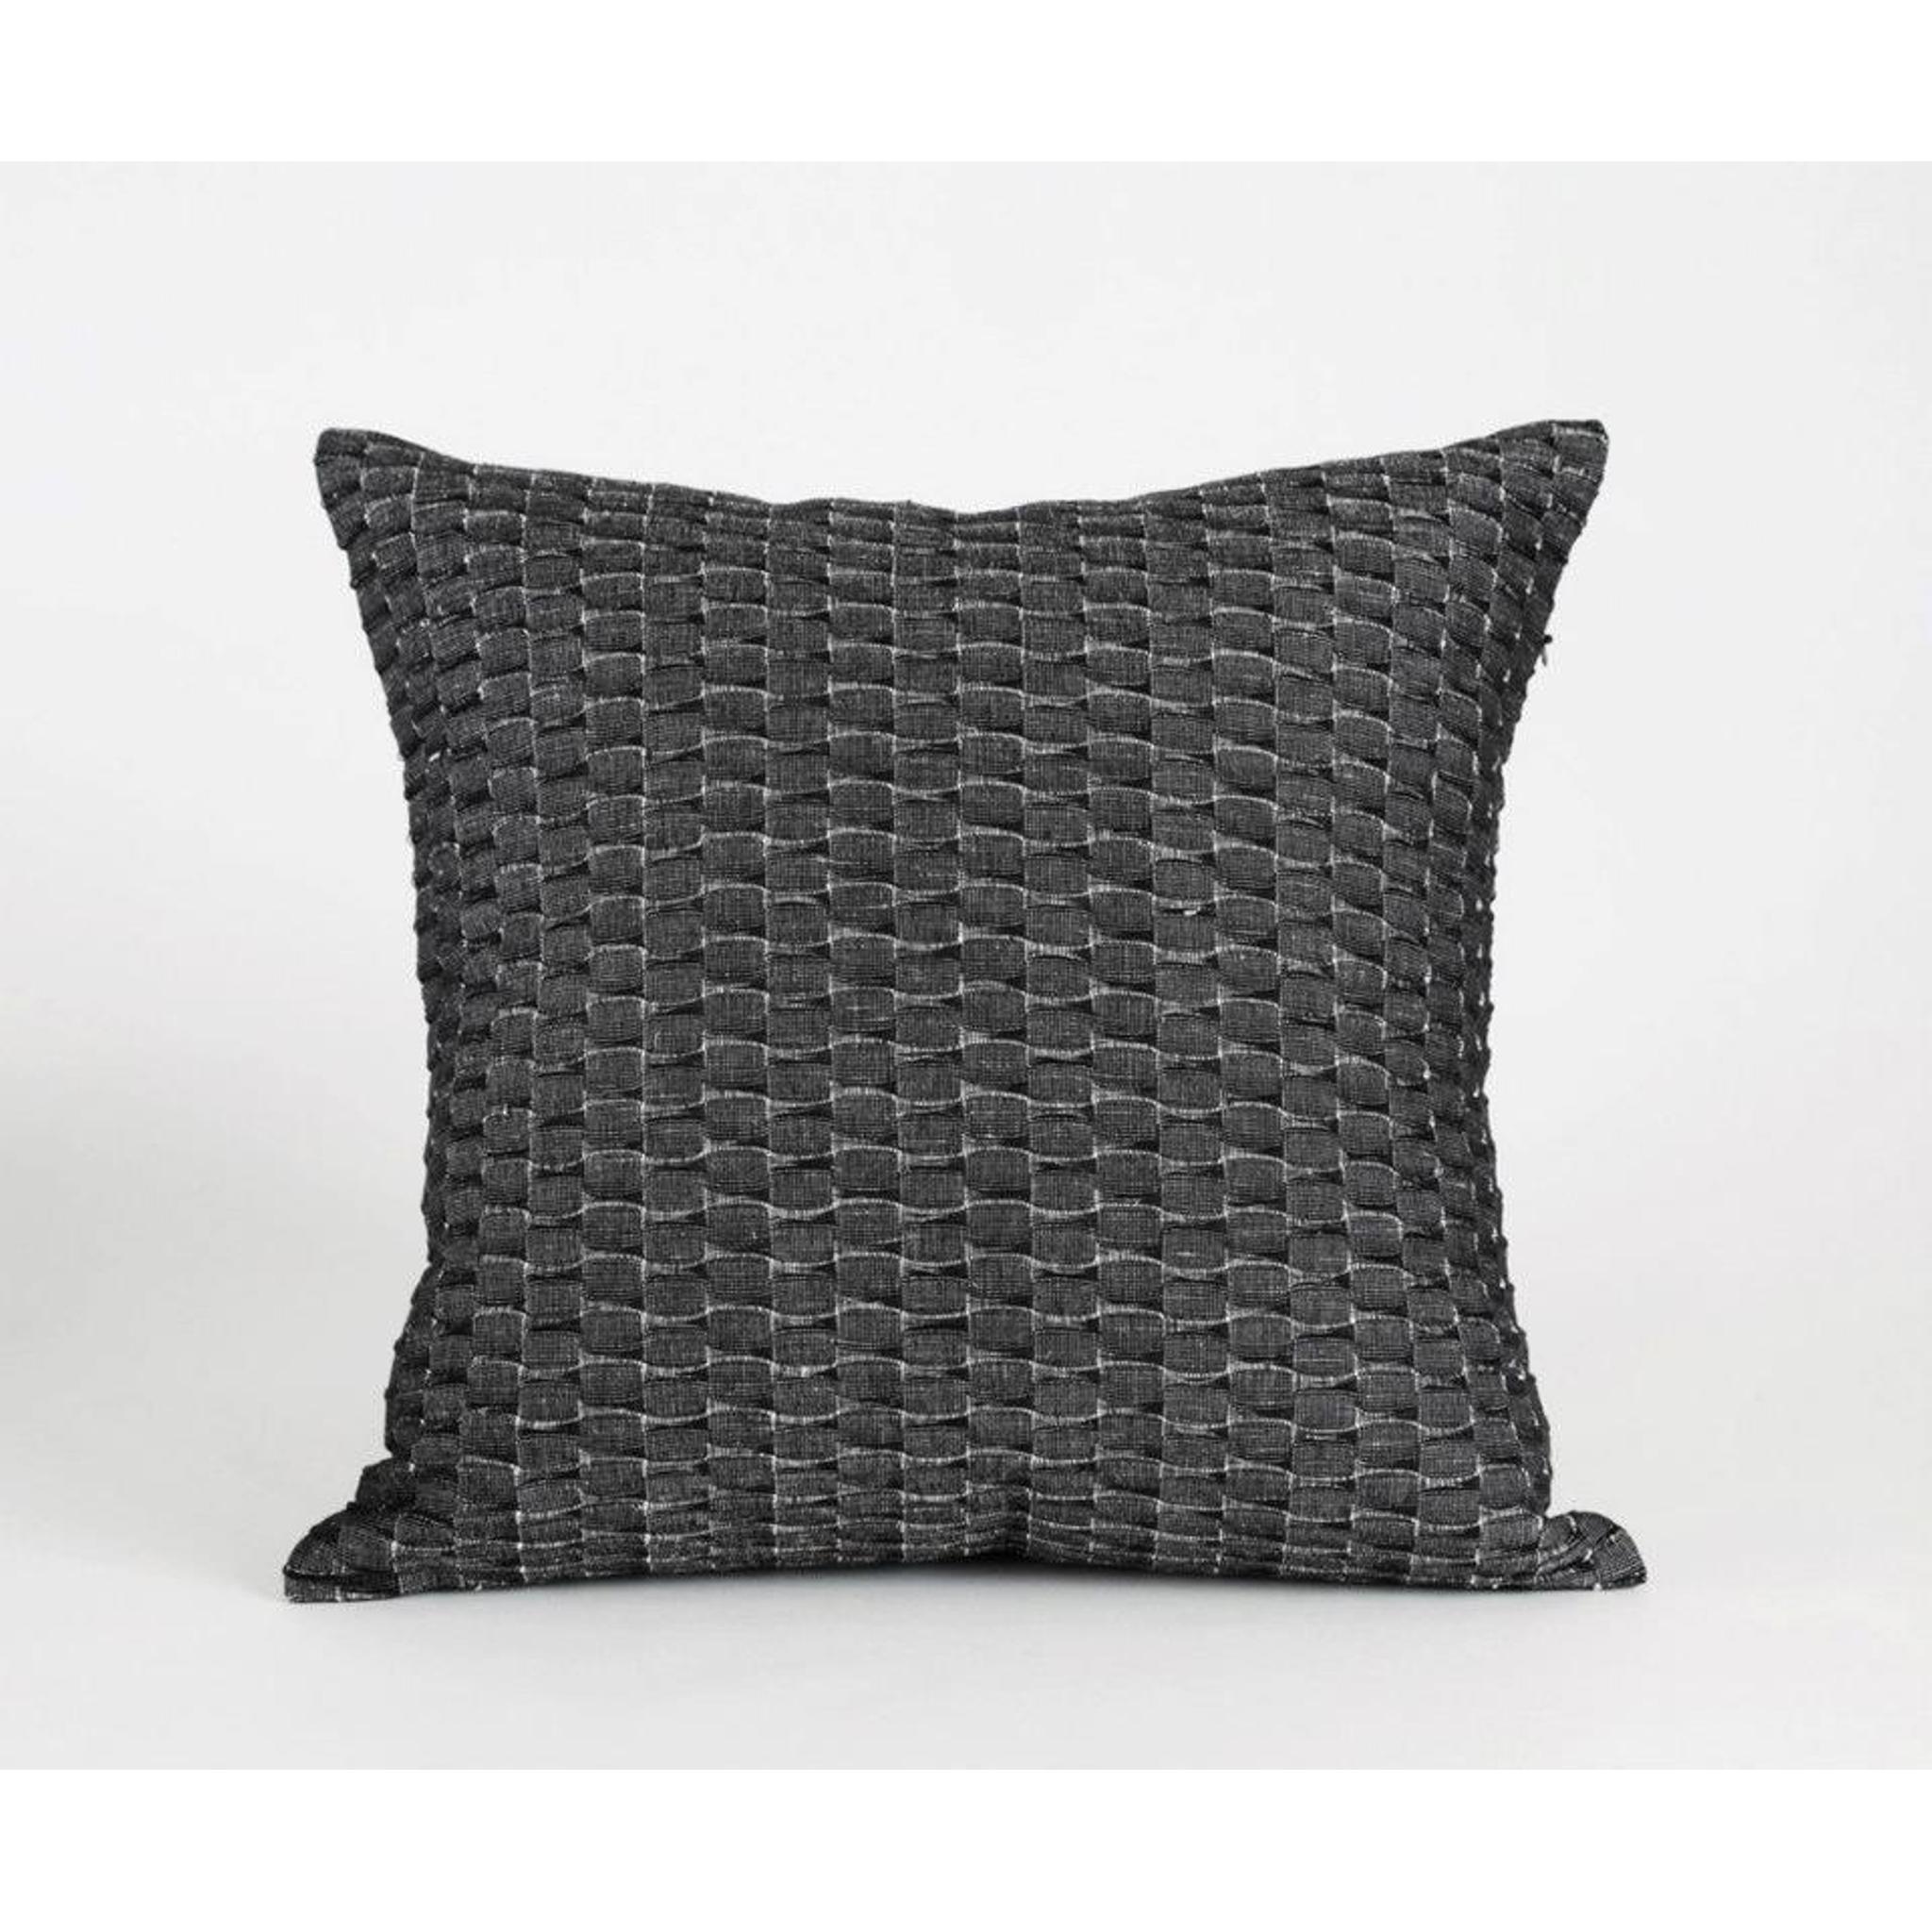 kissenh lle 50x50 cm dunkelgrau leinen baumwolle. Black Bedroom Furniture Sets. Home Design Ideas